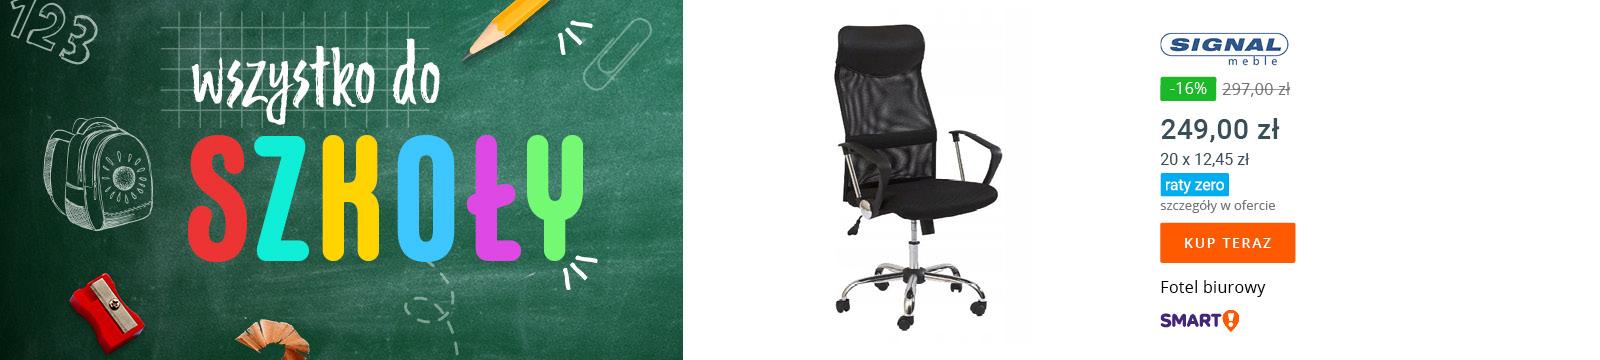 signal fotel biurowy 1600x360 0820